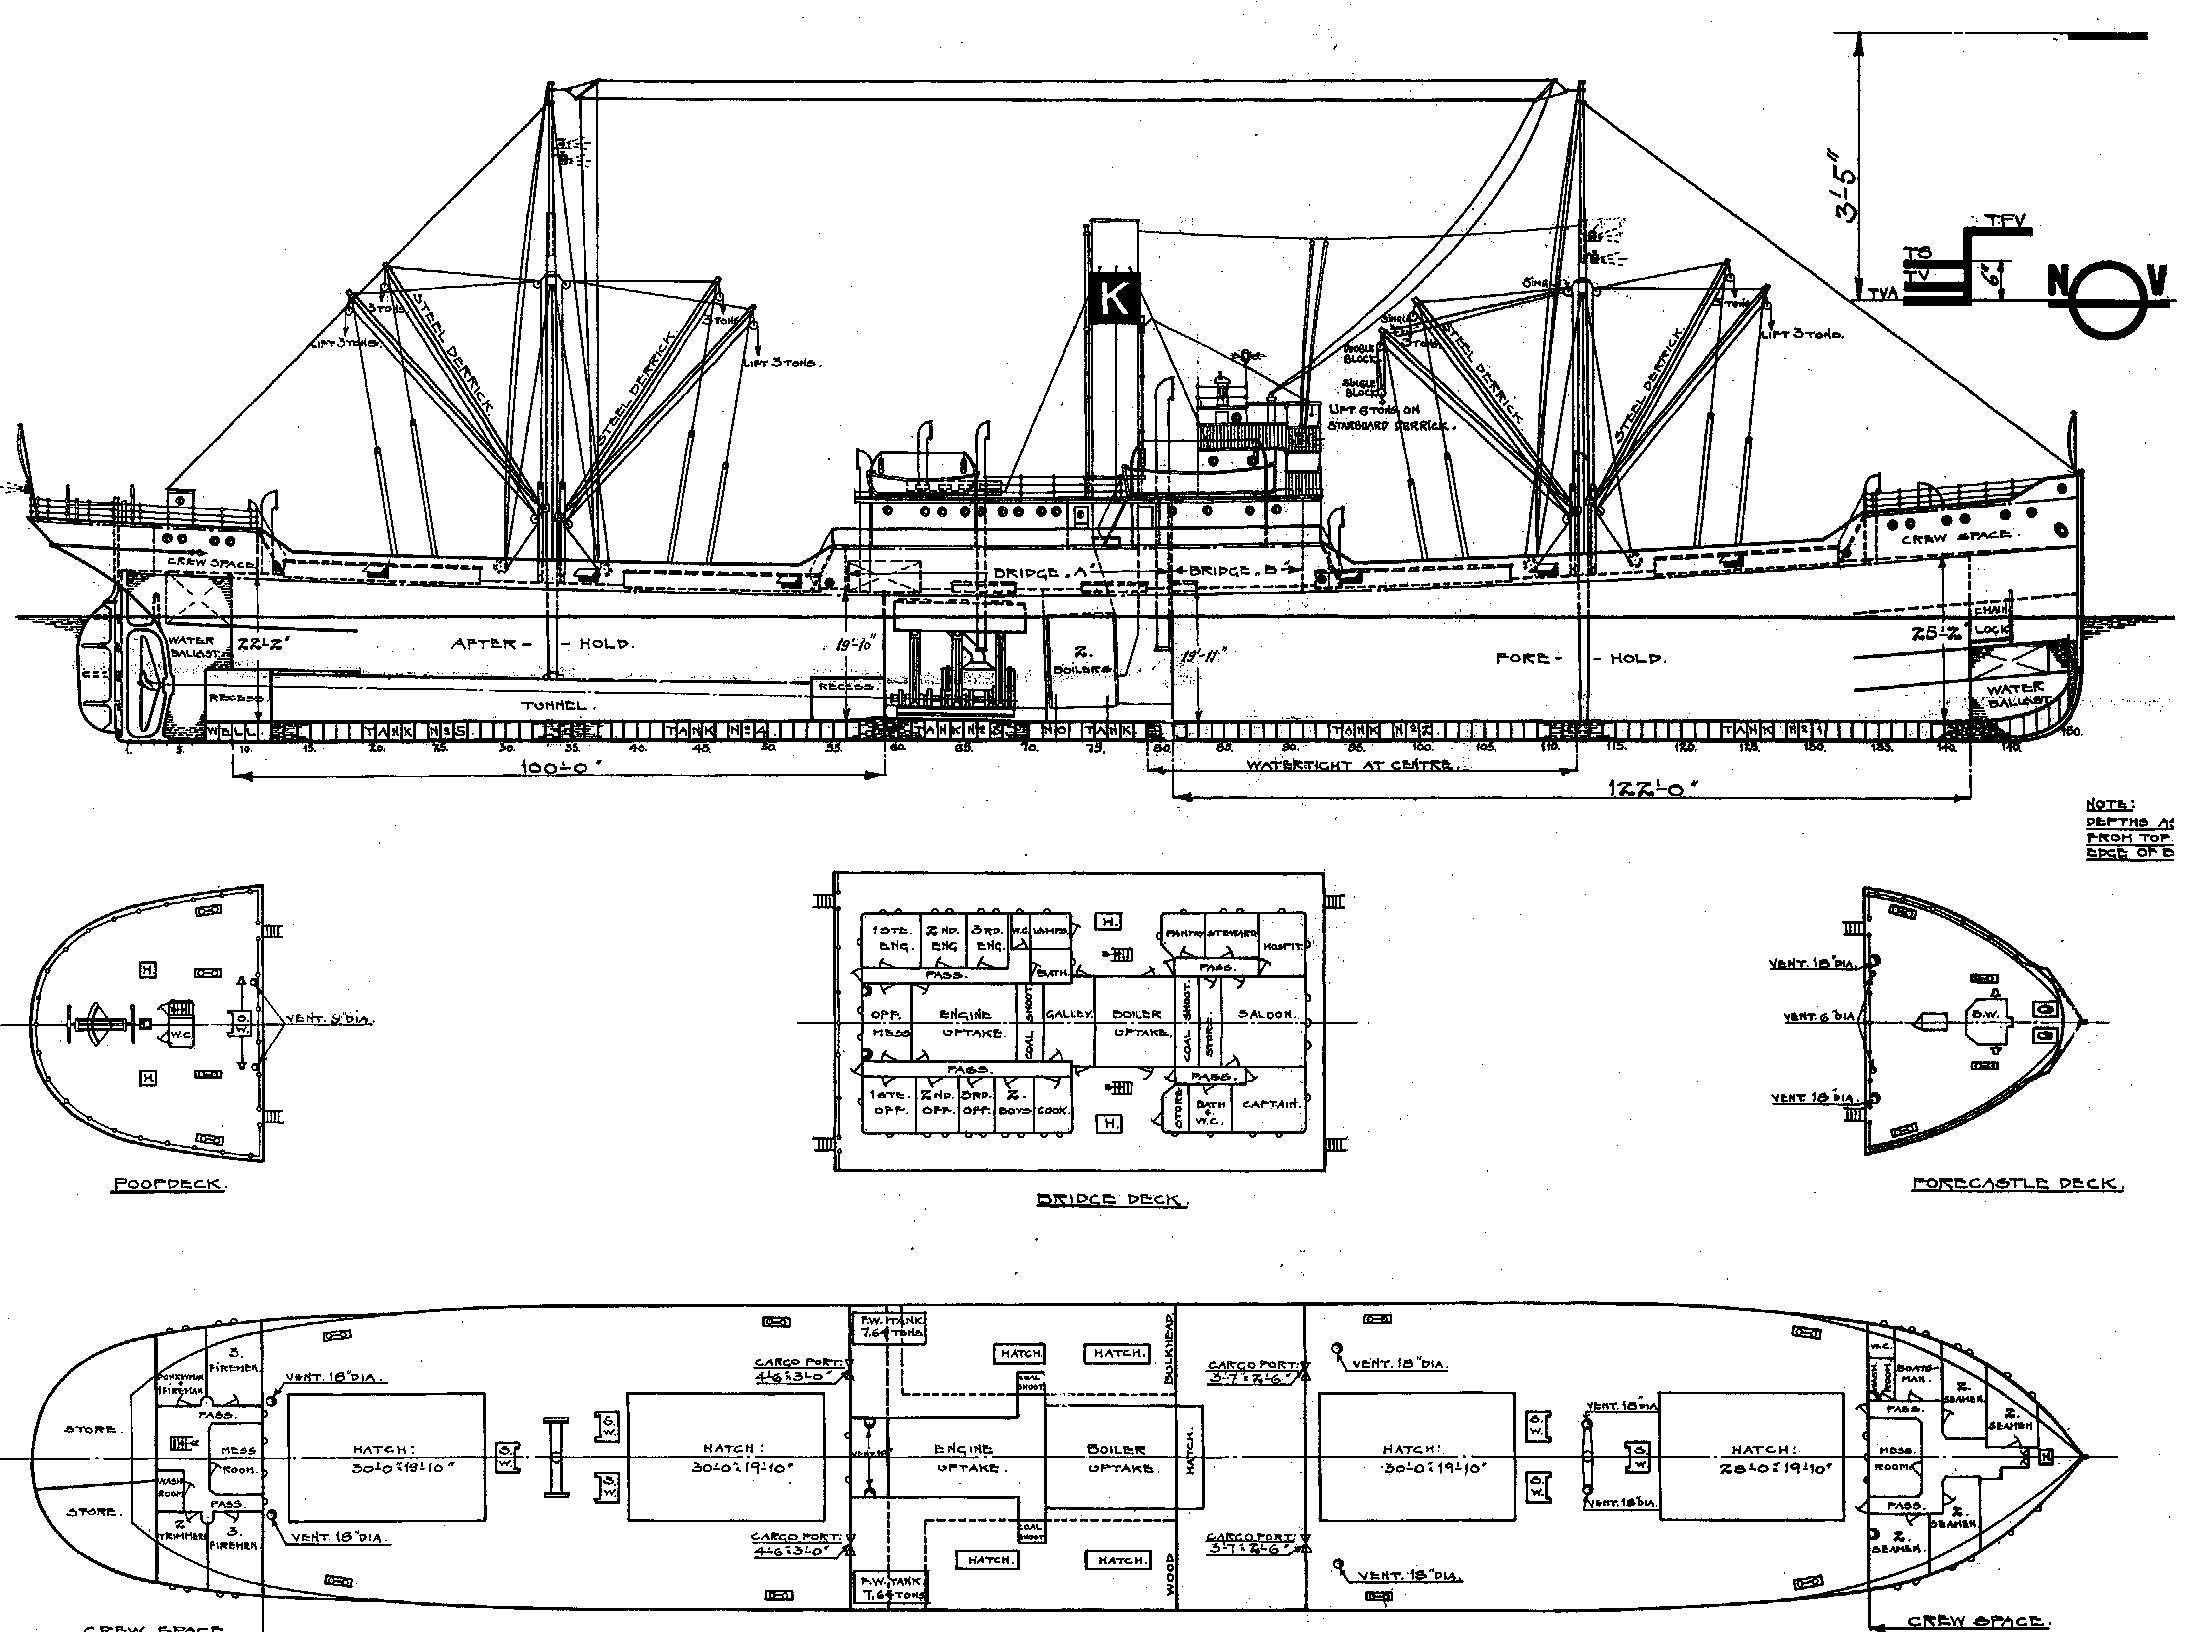 lisbeth-ships-plans